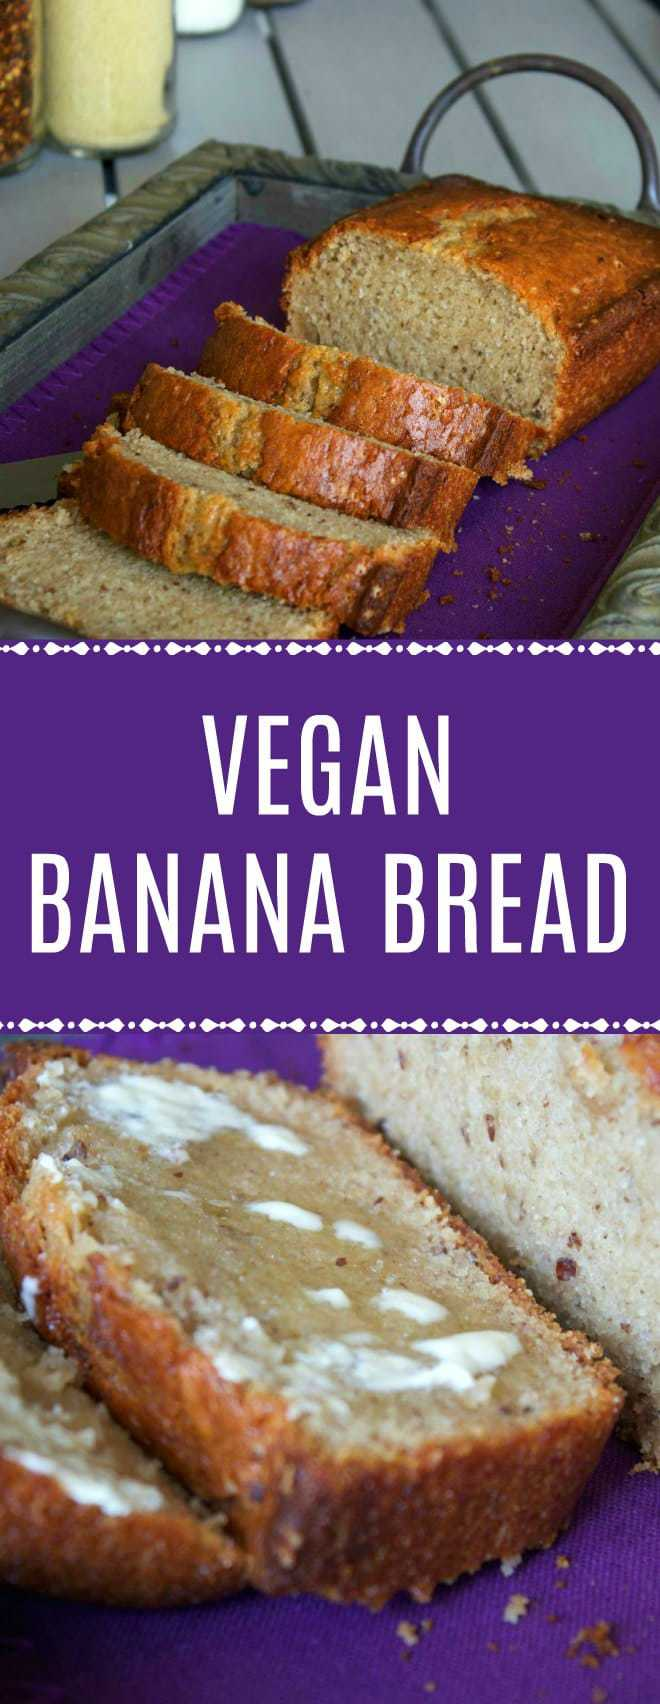 Simple Vegan Banana Bread - crispy on the outside, moist on the inside and delicious served warm from the oven with vegan butter! | lovingitvegan.com